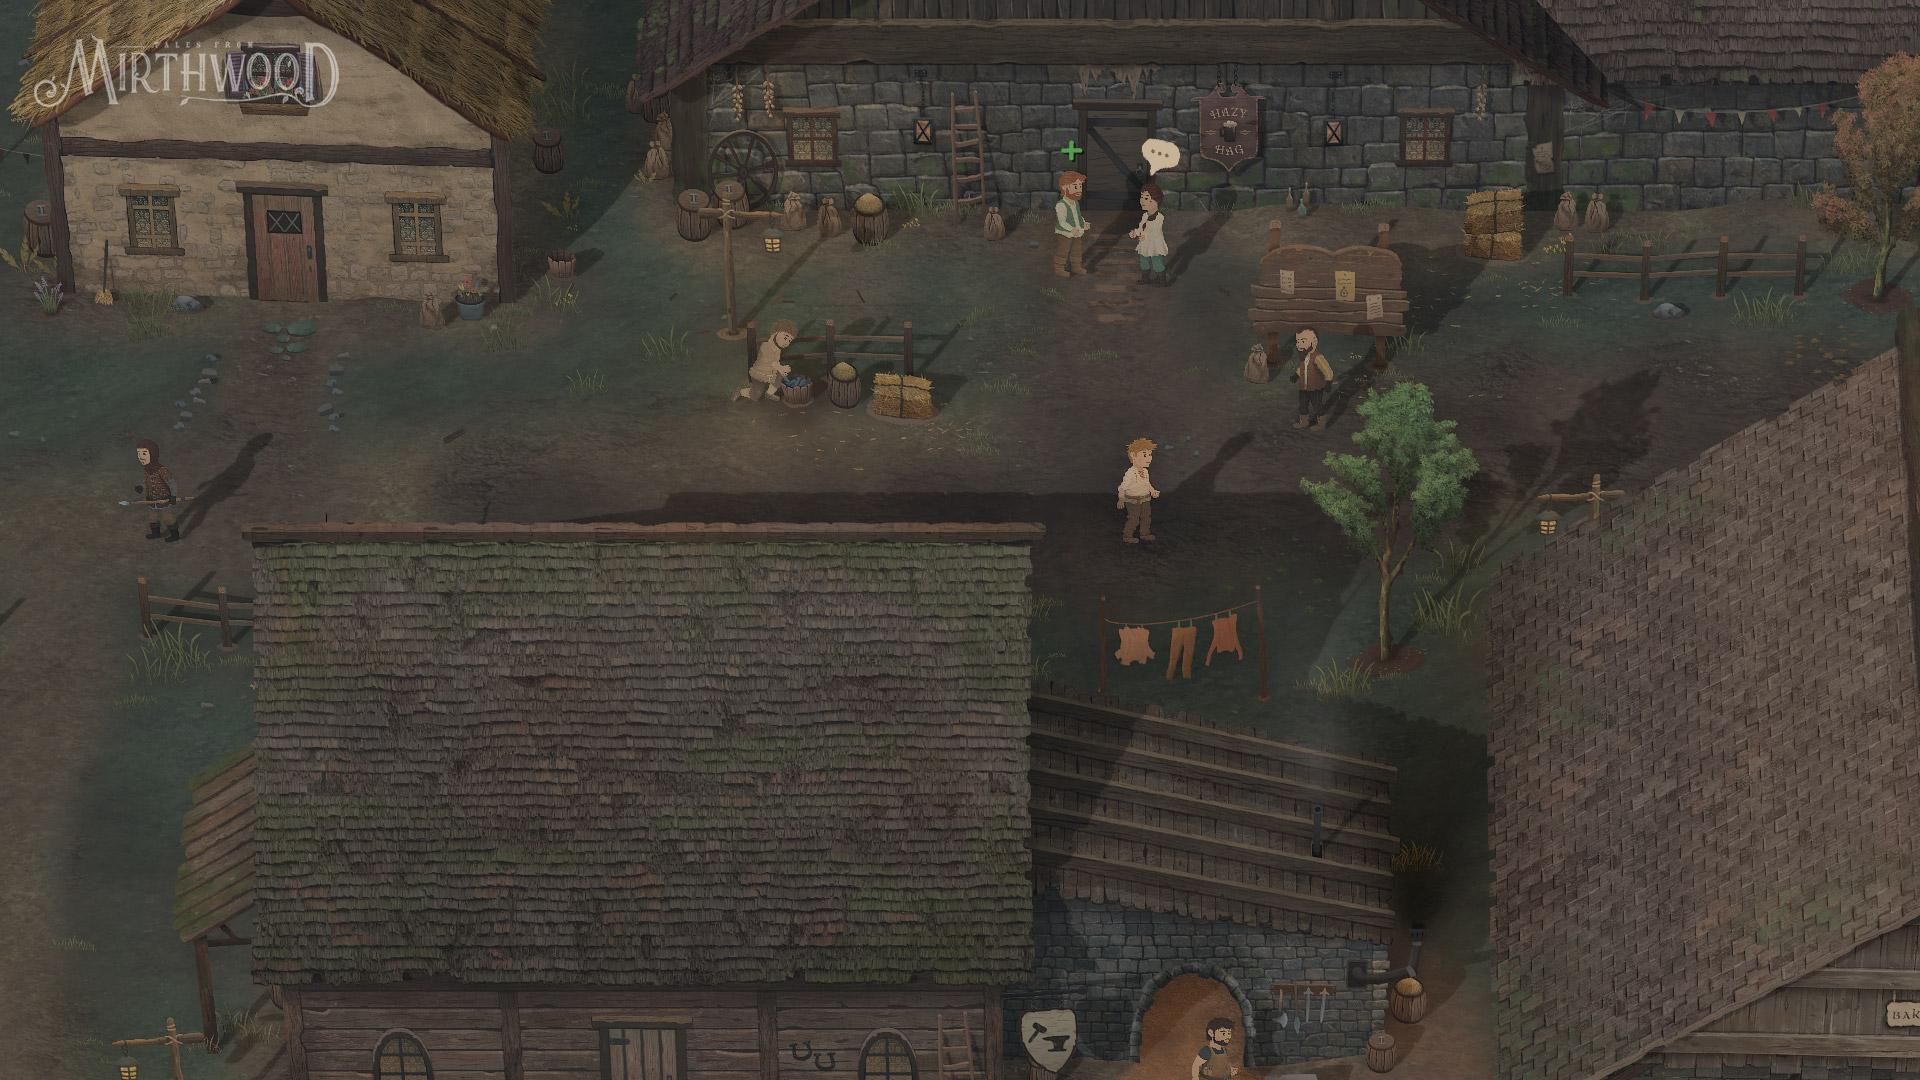 Mirthwood Town Screenshot